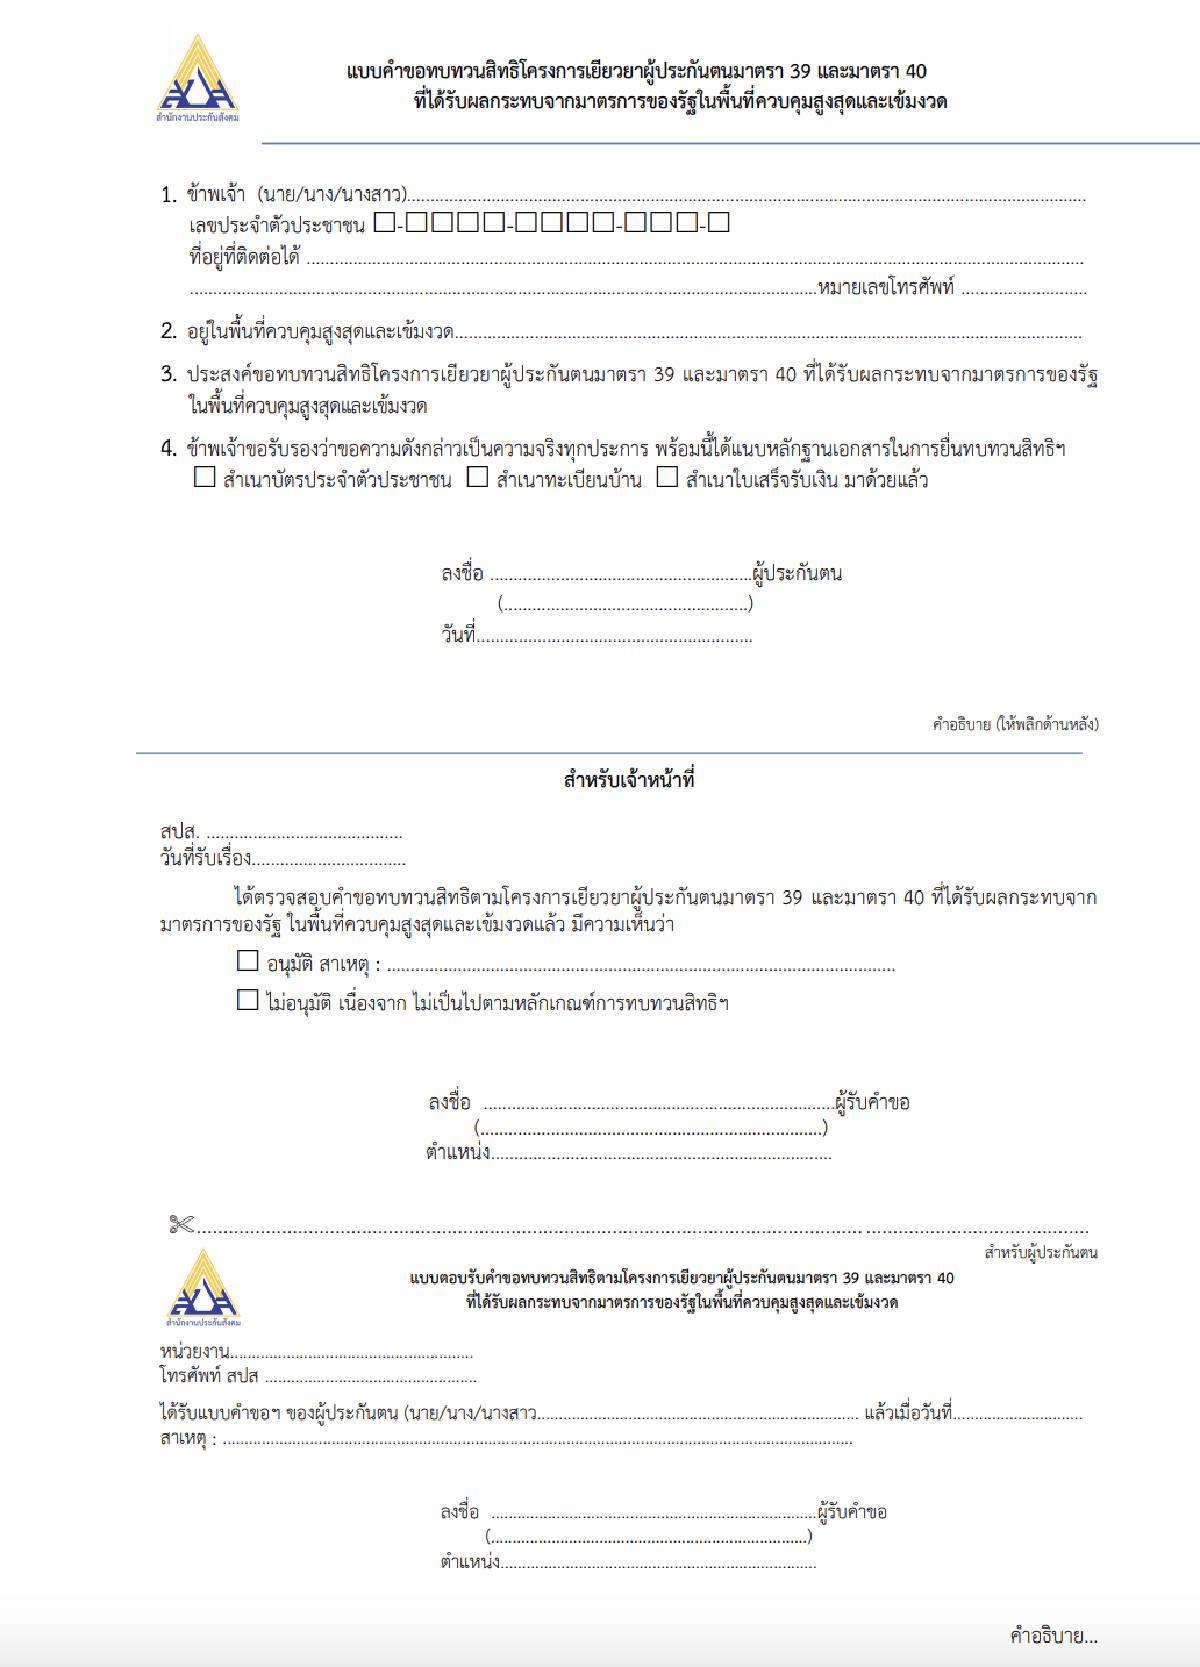 www.sso.go.th เงินเยียวยาประกันสังคมมาตรา 40  เปิดให้ทบทวนสิทธิ คลิกด่วน